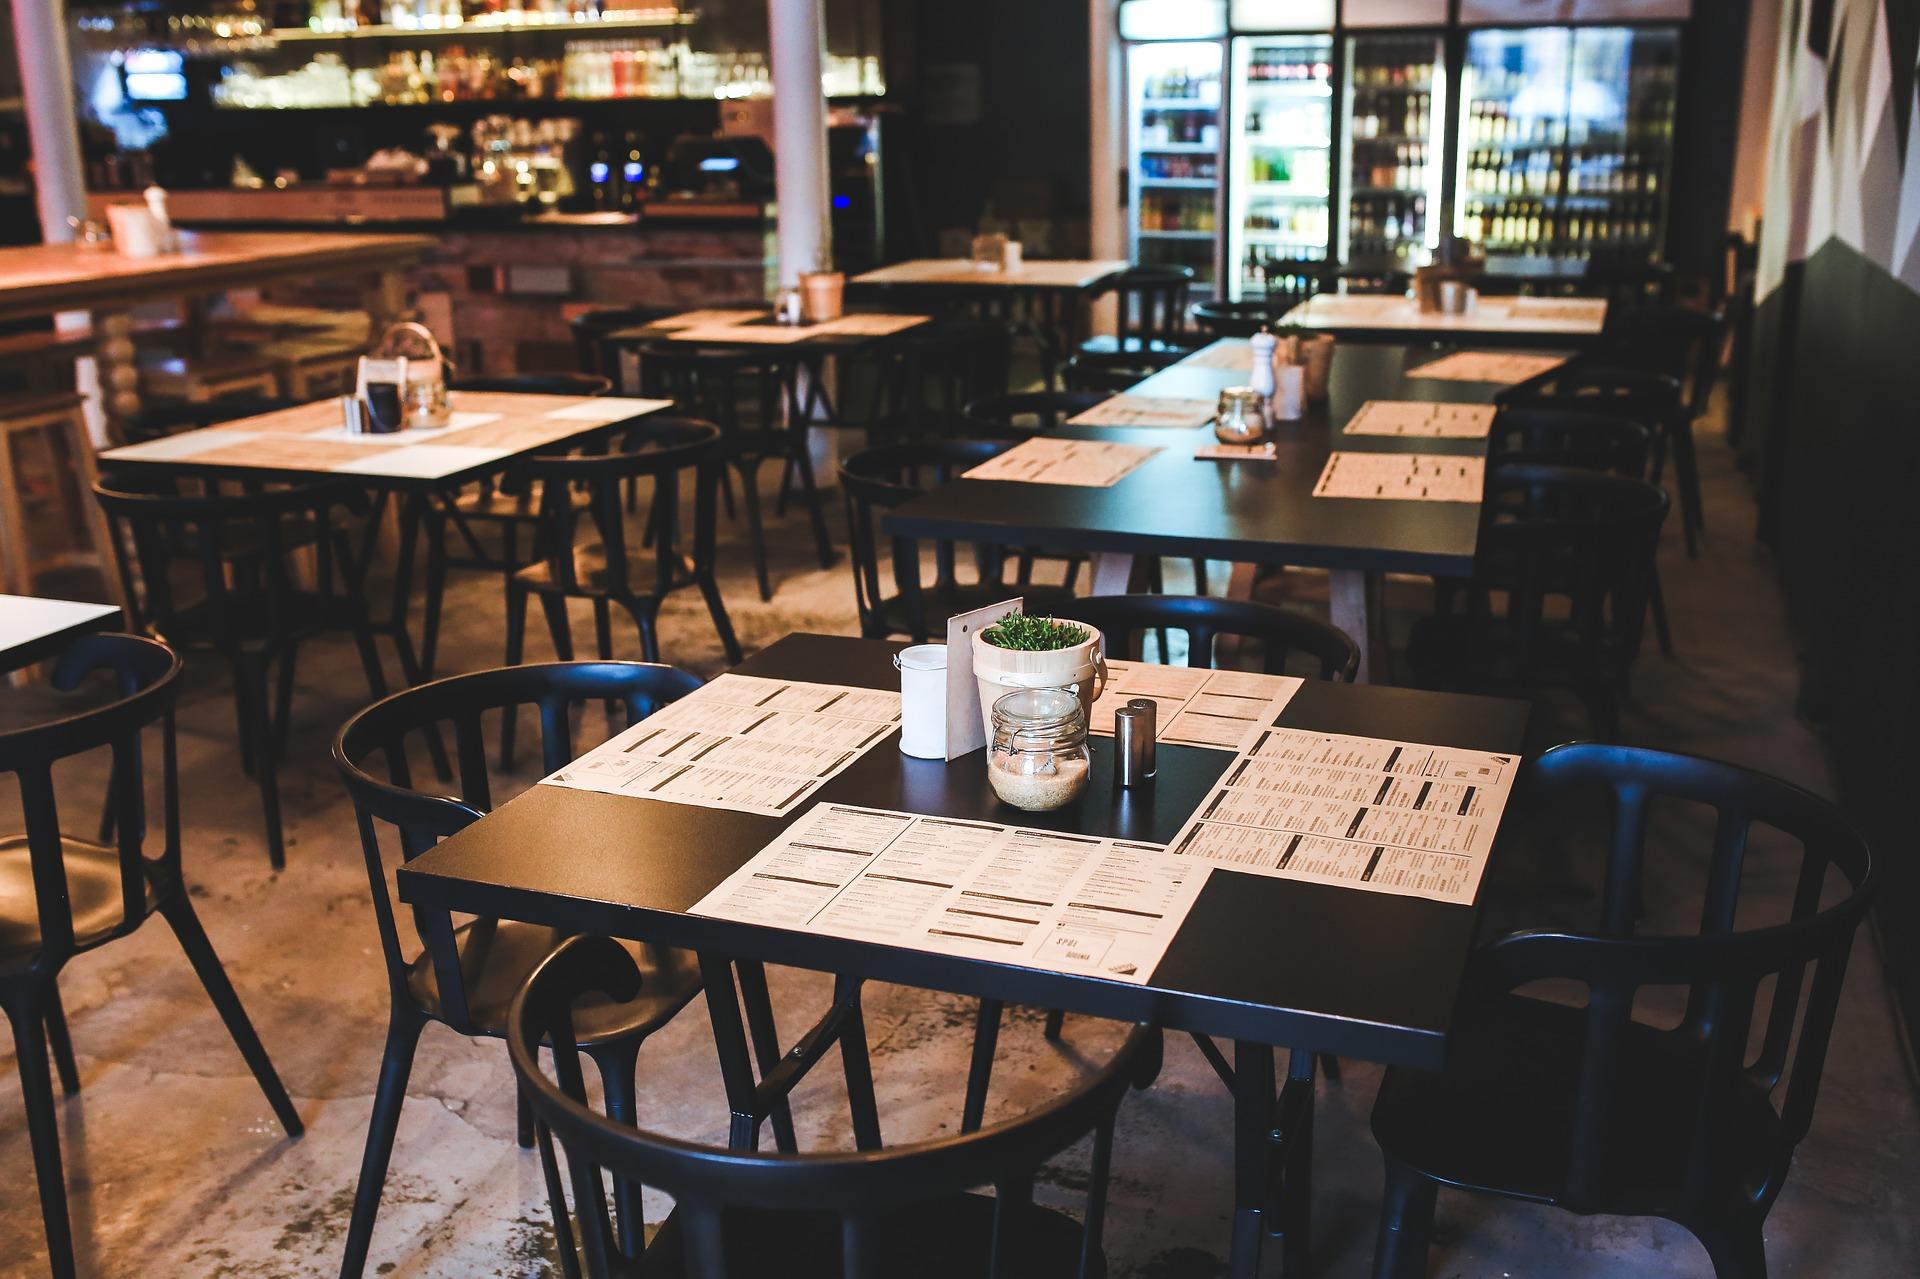 business-insurance-muskegon-mi, restaurant-insurance-michigan